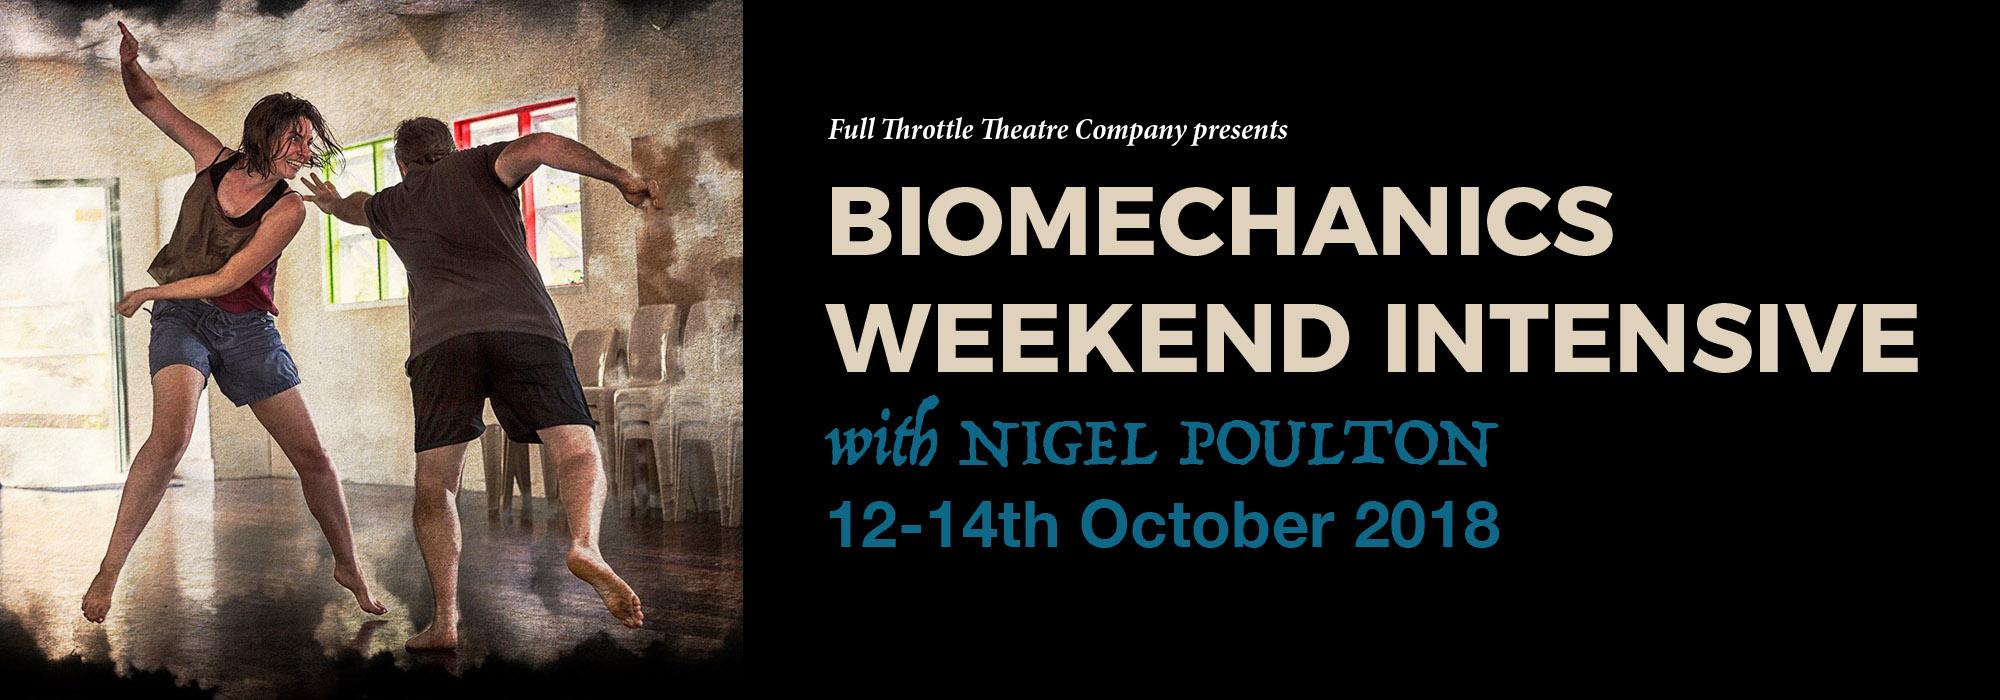 biomechanics weekend intensive banner 2018